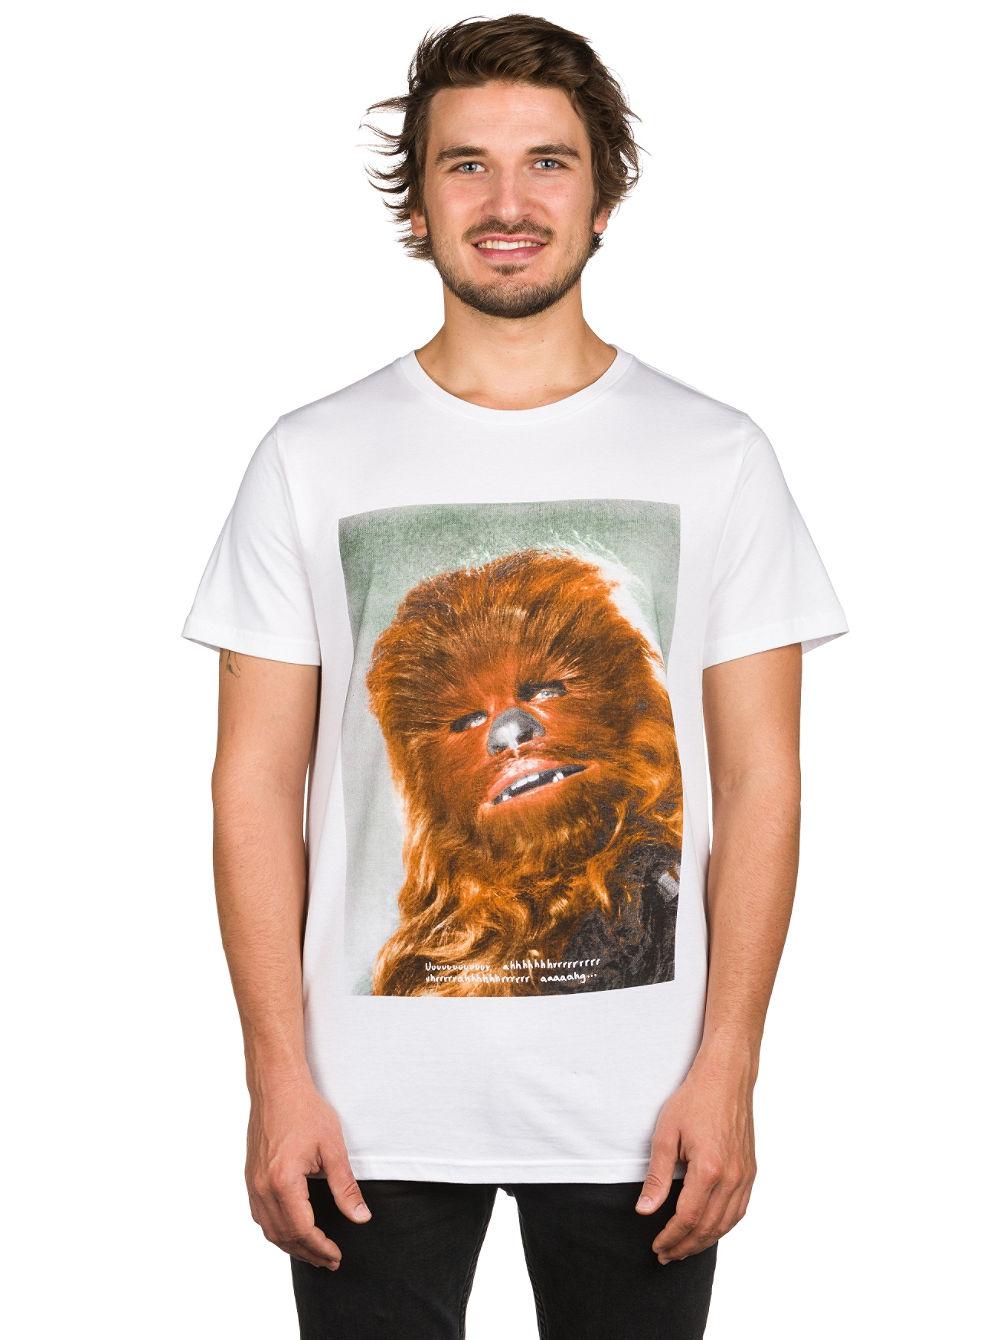 chewbacca-quote-star-wars-t-shirt